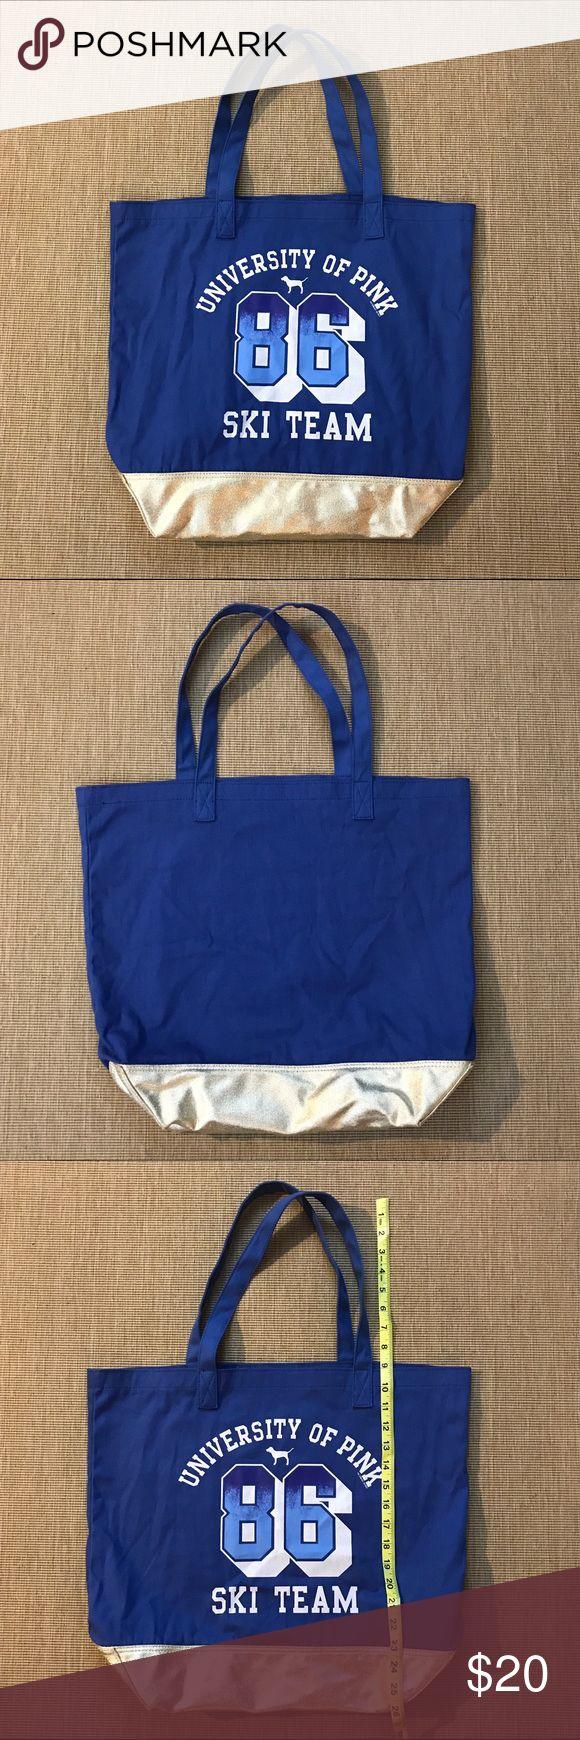 Victoria's Secret PINK SKI TEAM Blue Gold Tote Bag UNIVERSITY OF PINK 86 SKI TEAM Blue Sholder Bag. In like new condition. Gold shiny bottom of the bag. See photo for measurements. PINK Victoria's Secret Bags Shoulder Bags